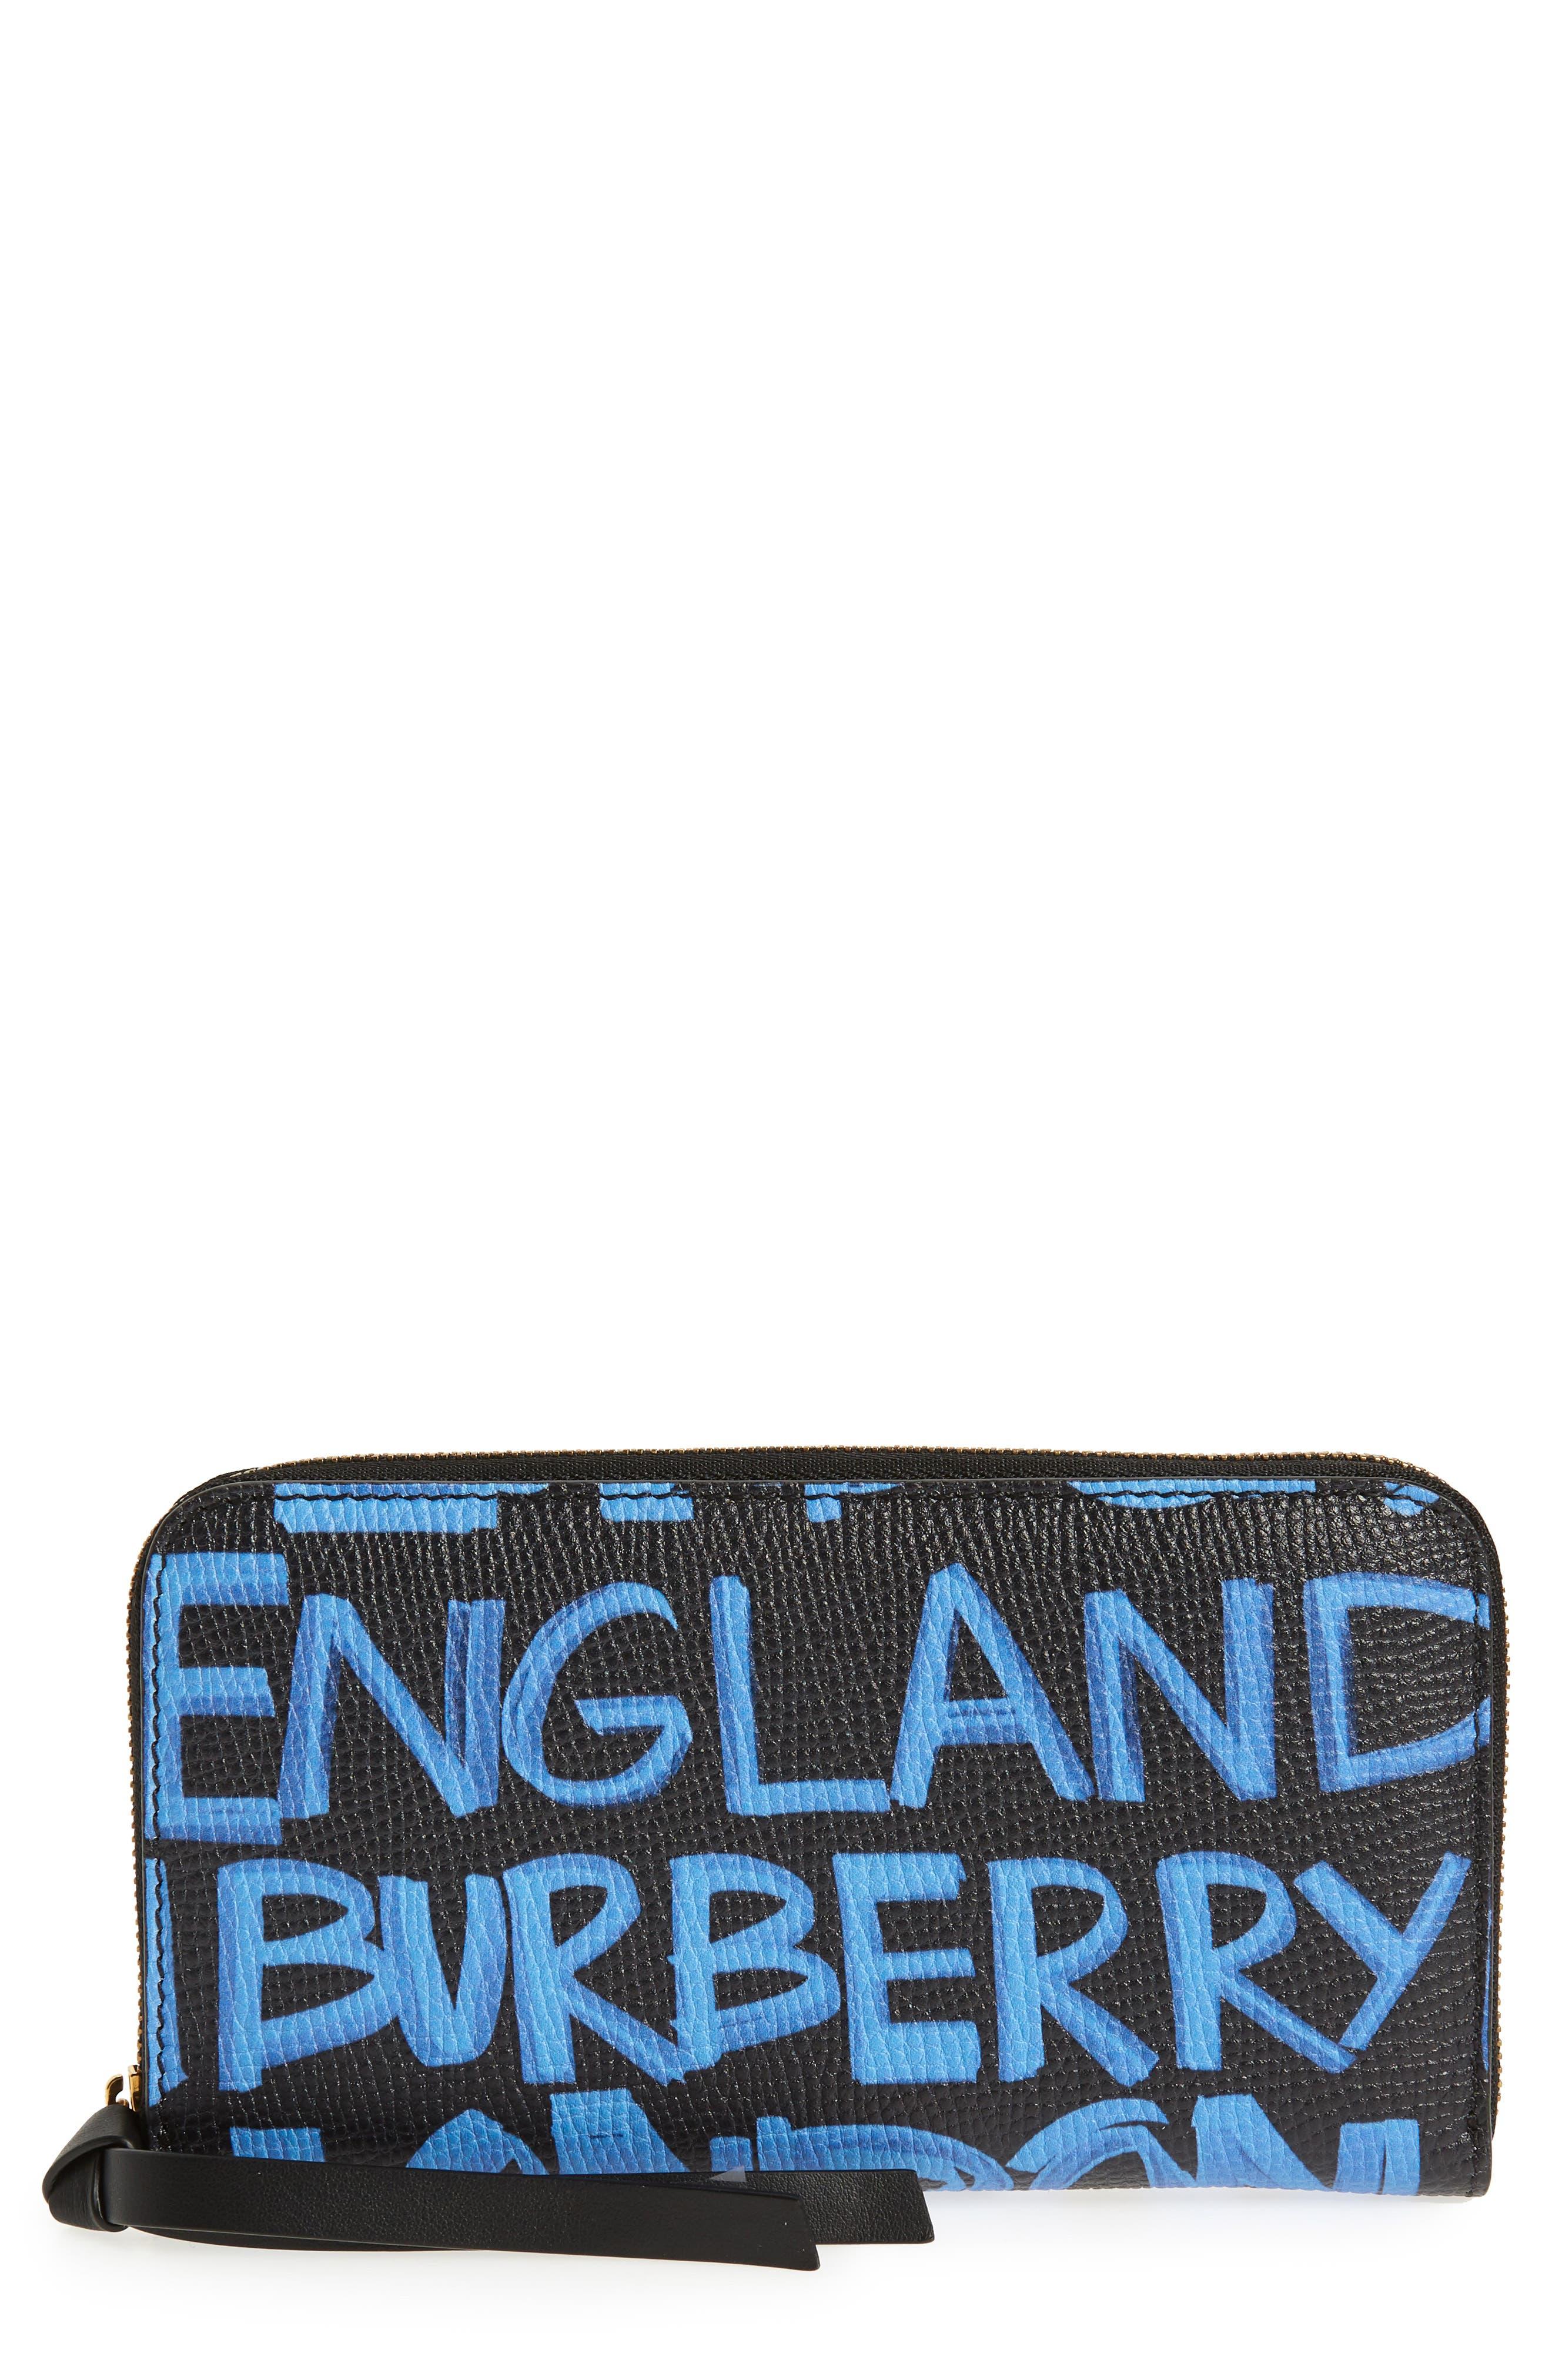 Burberry Elmore Graffiti Print Leather Zip Around Wallet